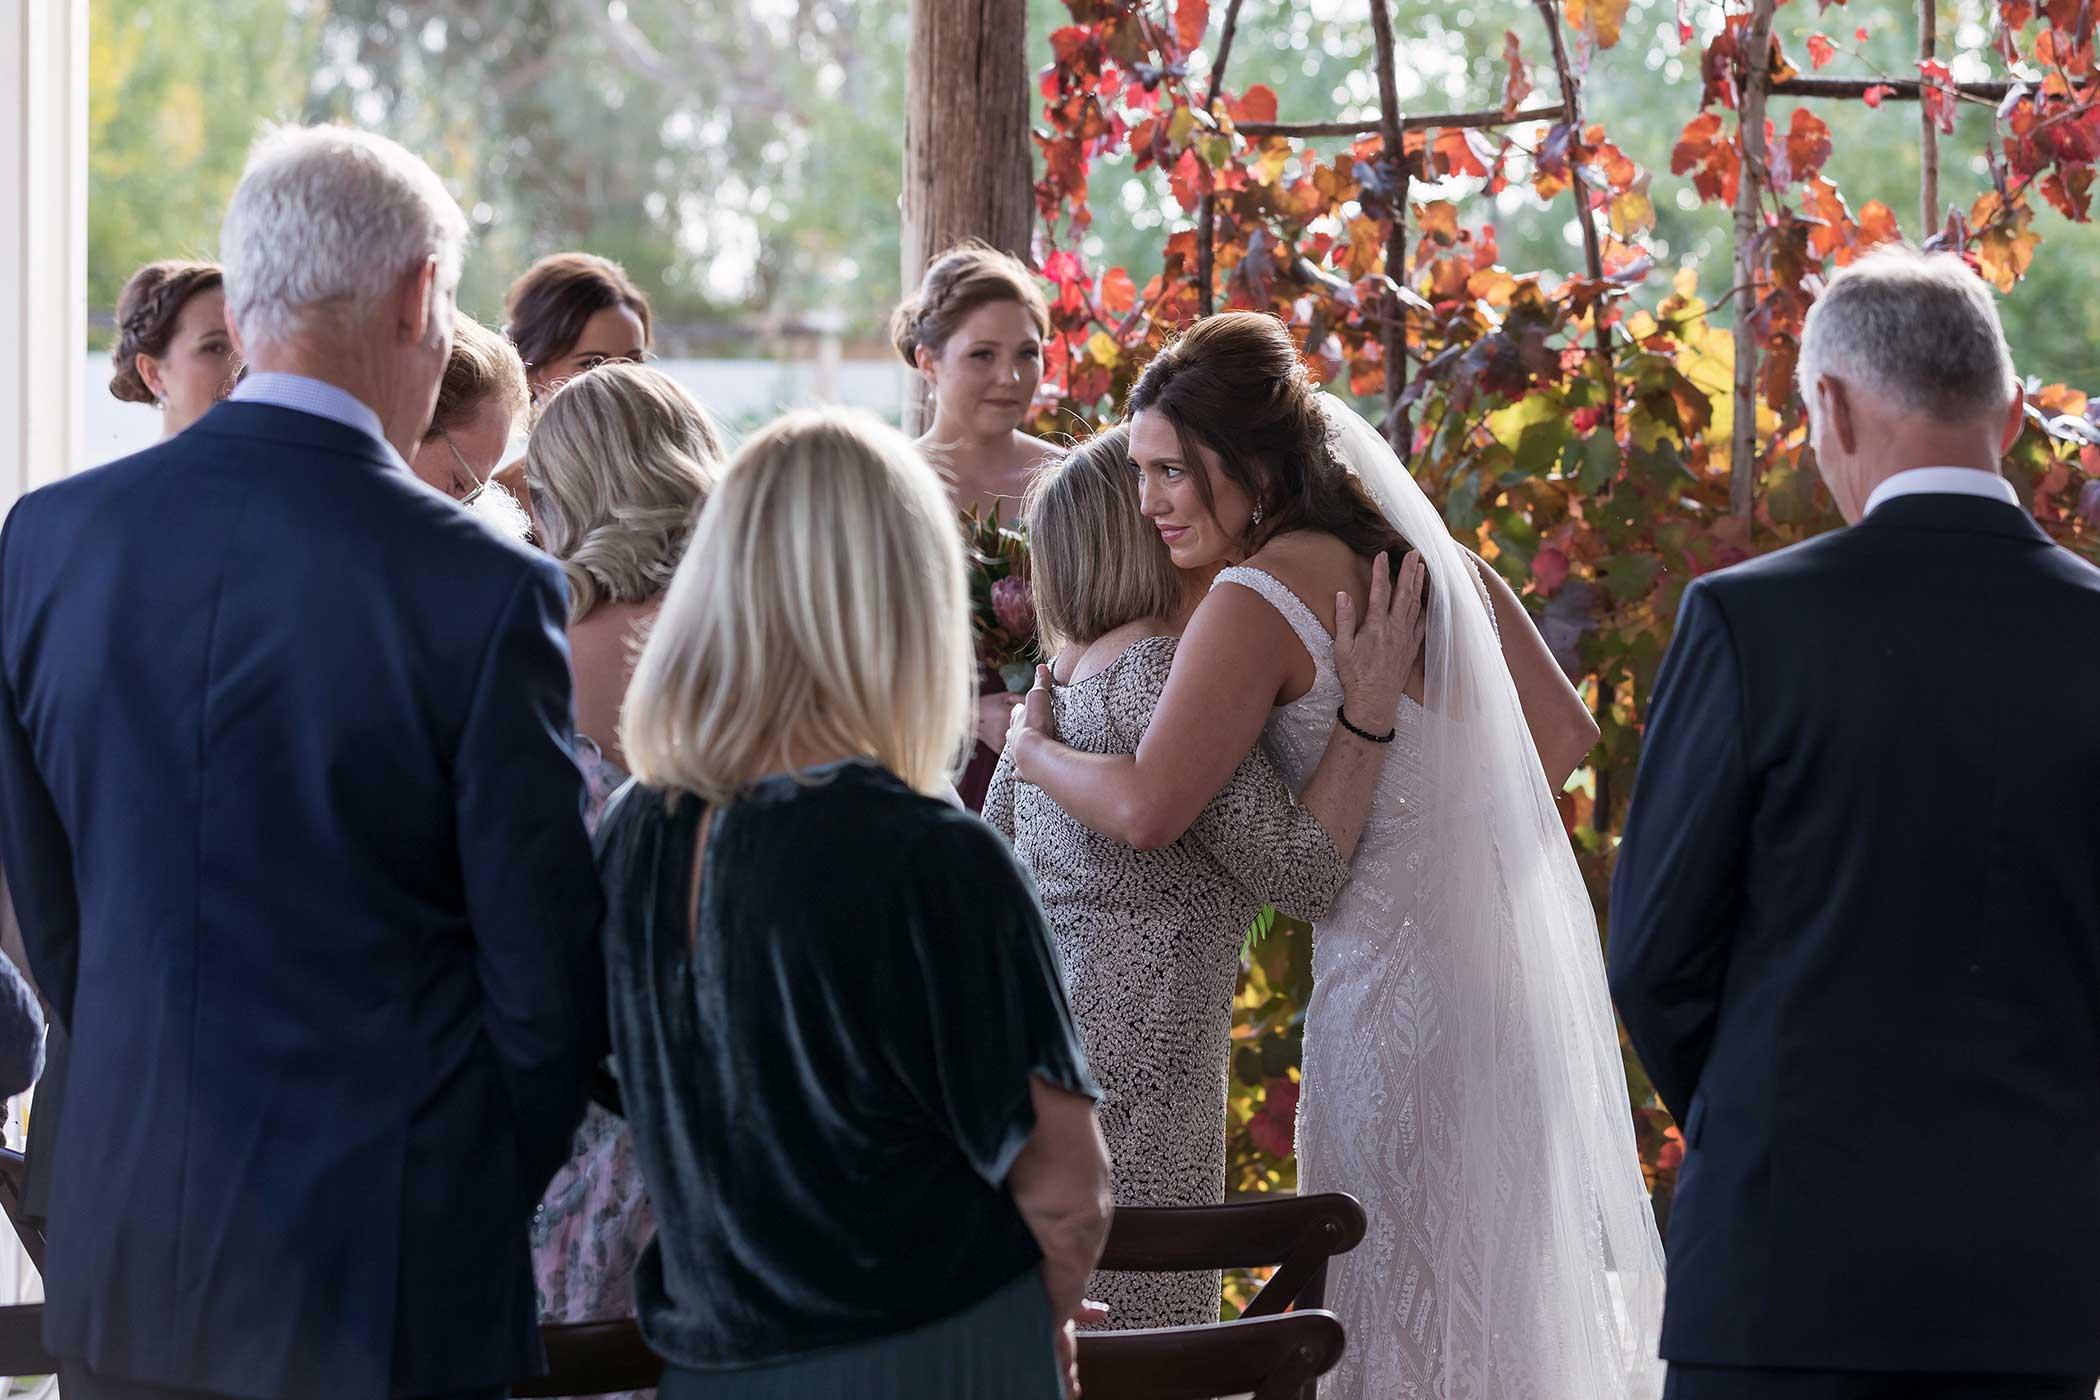 Wedding Photography Victoria by AIPP Wedding Photographer Jason Robins